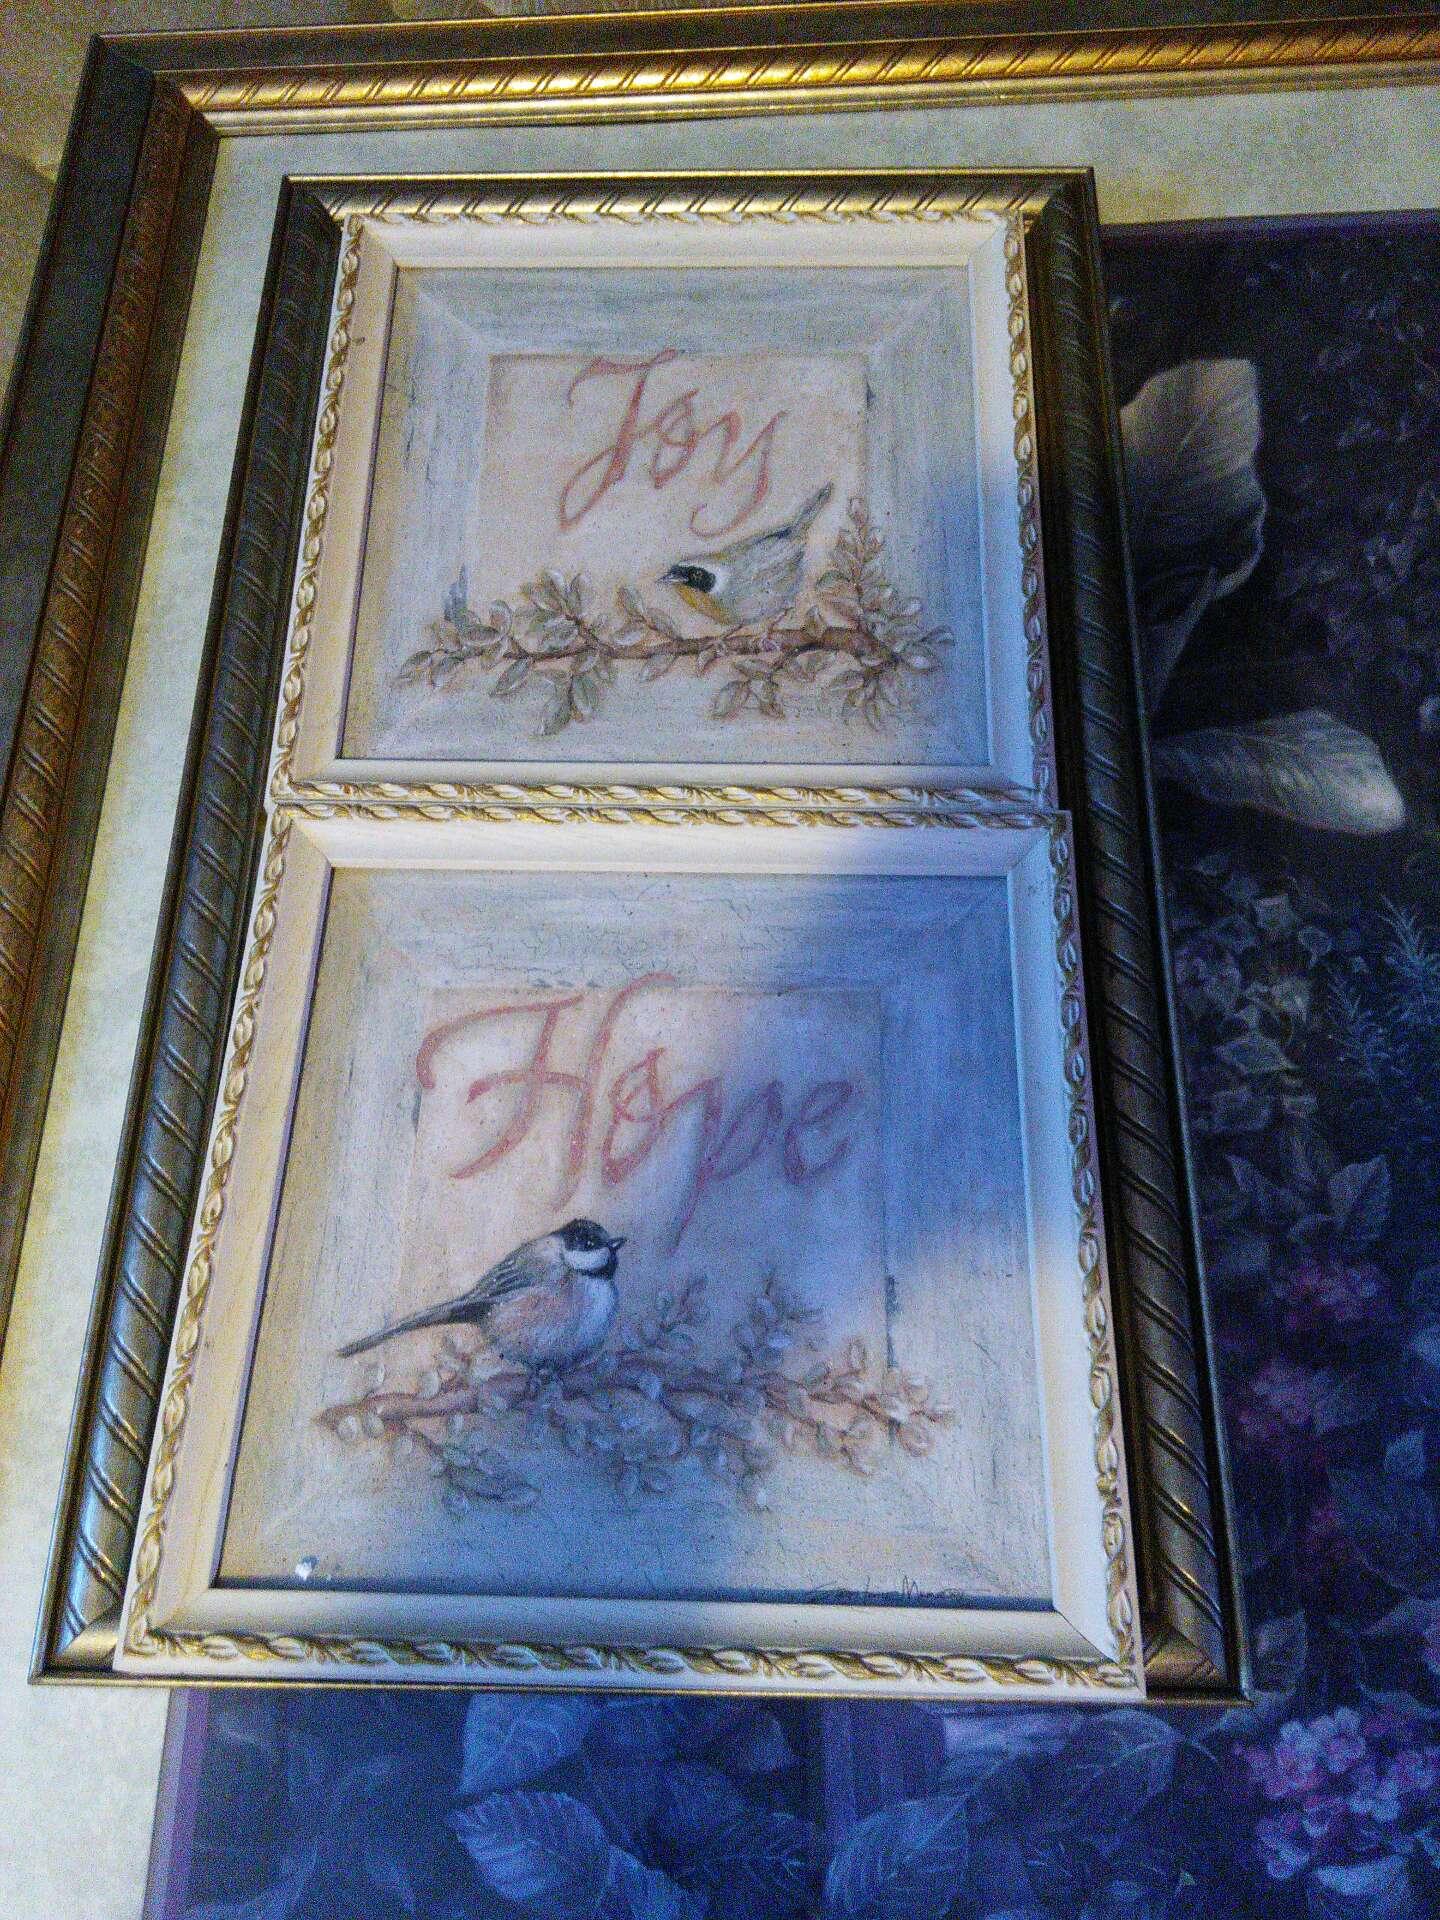 Home Interior Frames For Sale In San Antonio Tx 5miles